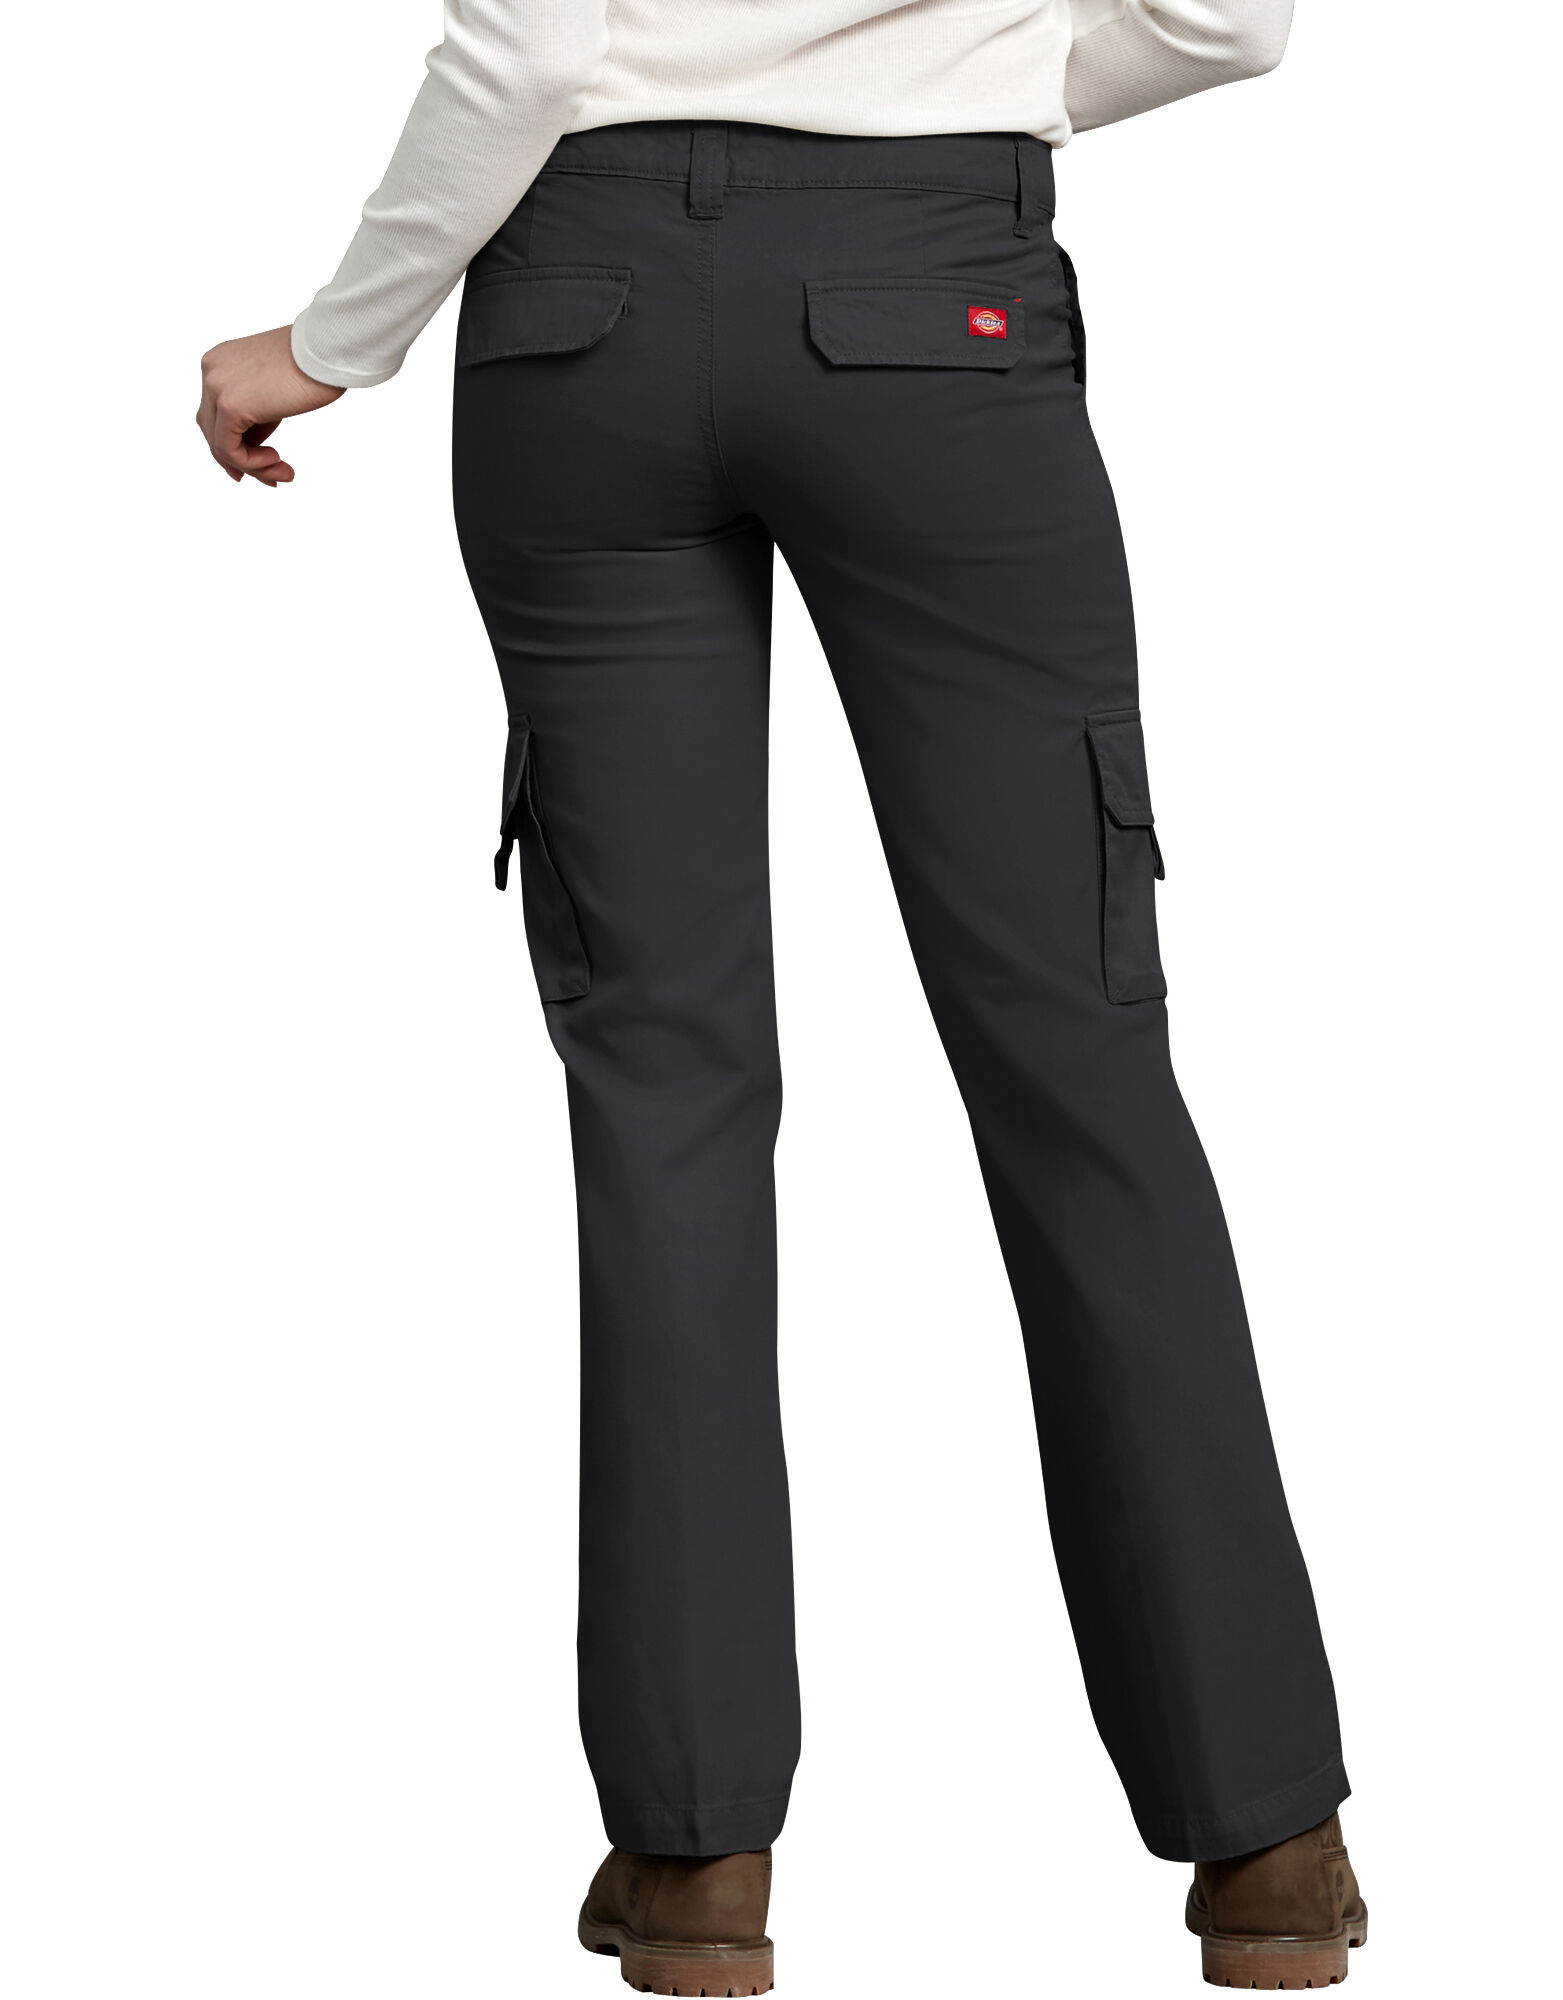 Popular Womens Cargo Pants Tall  Womens Cargo Pants Plus Size  Fashion Style